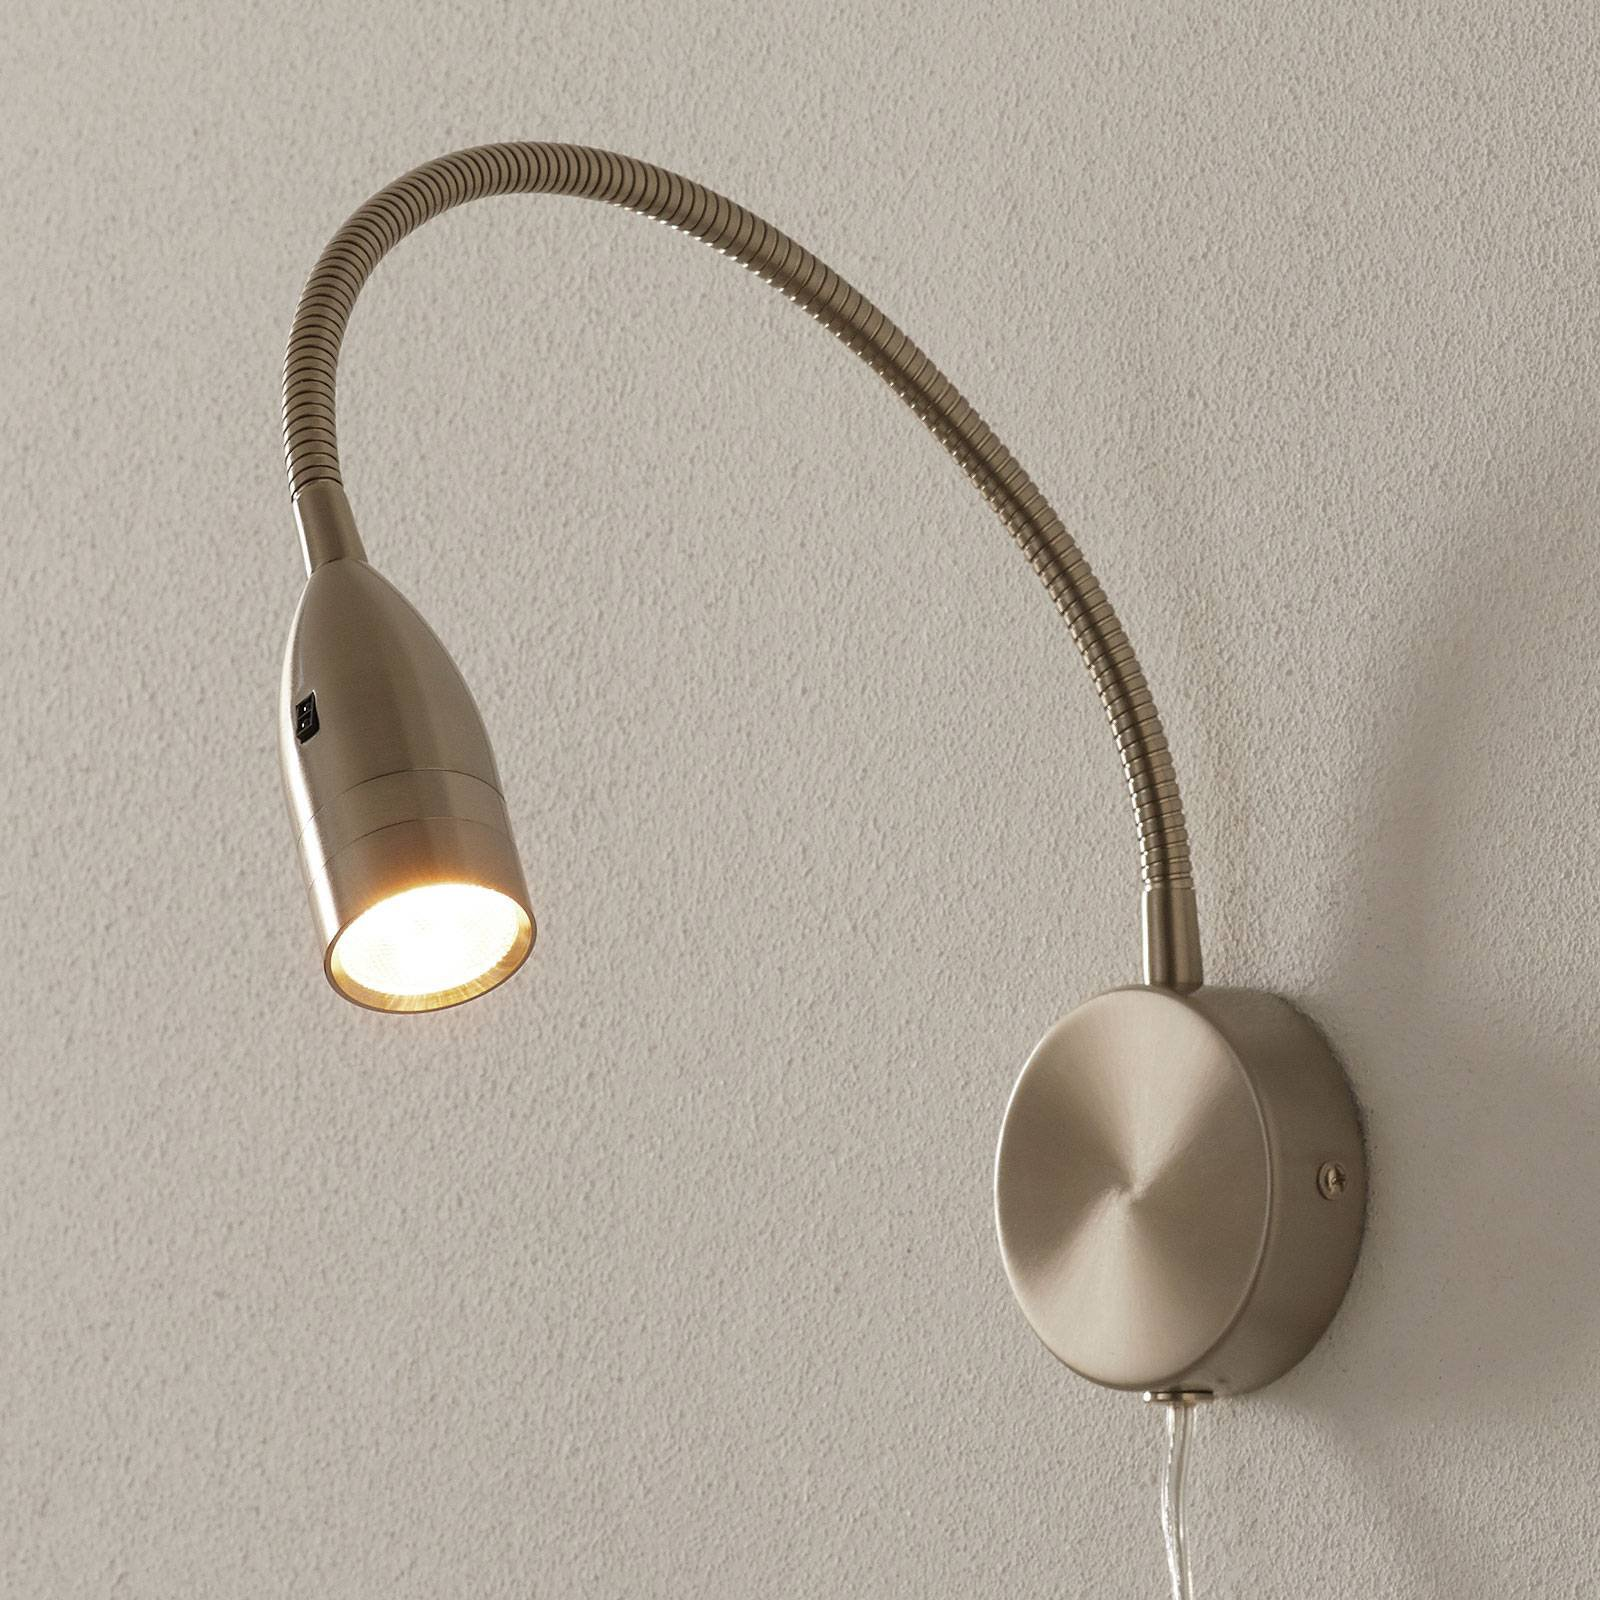 LED-vegglampe Sten bev.styring, veggfeste, rund